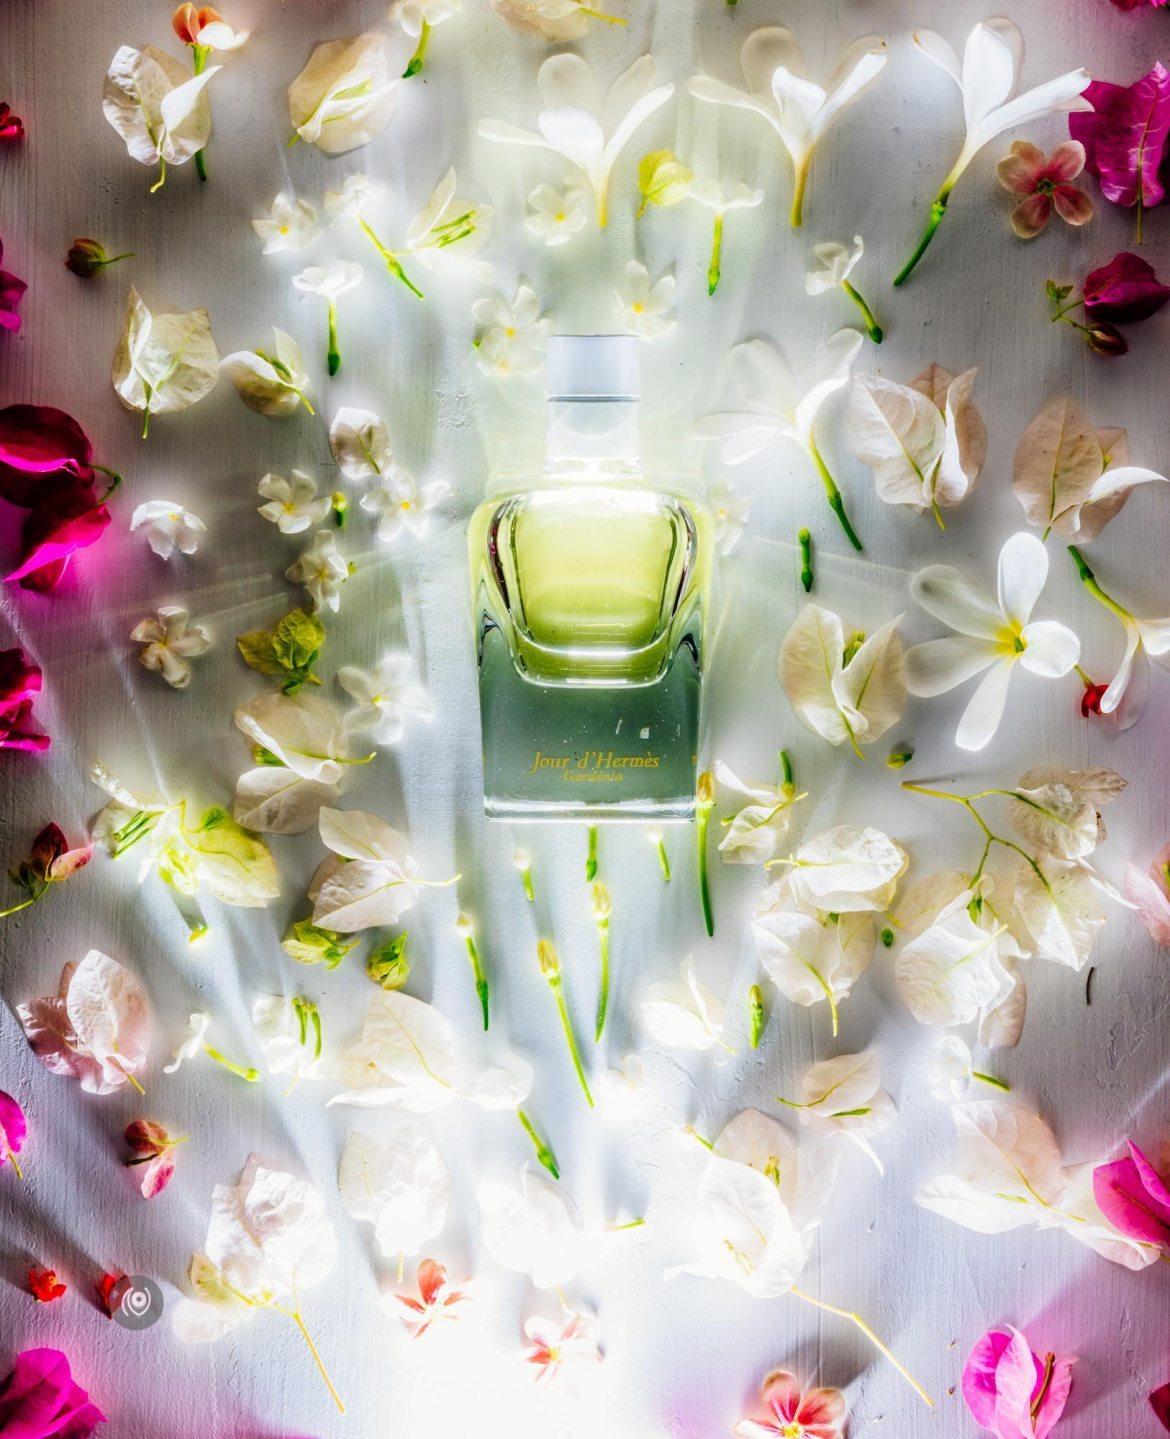 FragranceOfTheMonth-Naina.co-Jour-Hermes-Gardenia-EyesForLuxury-10